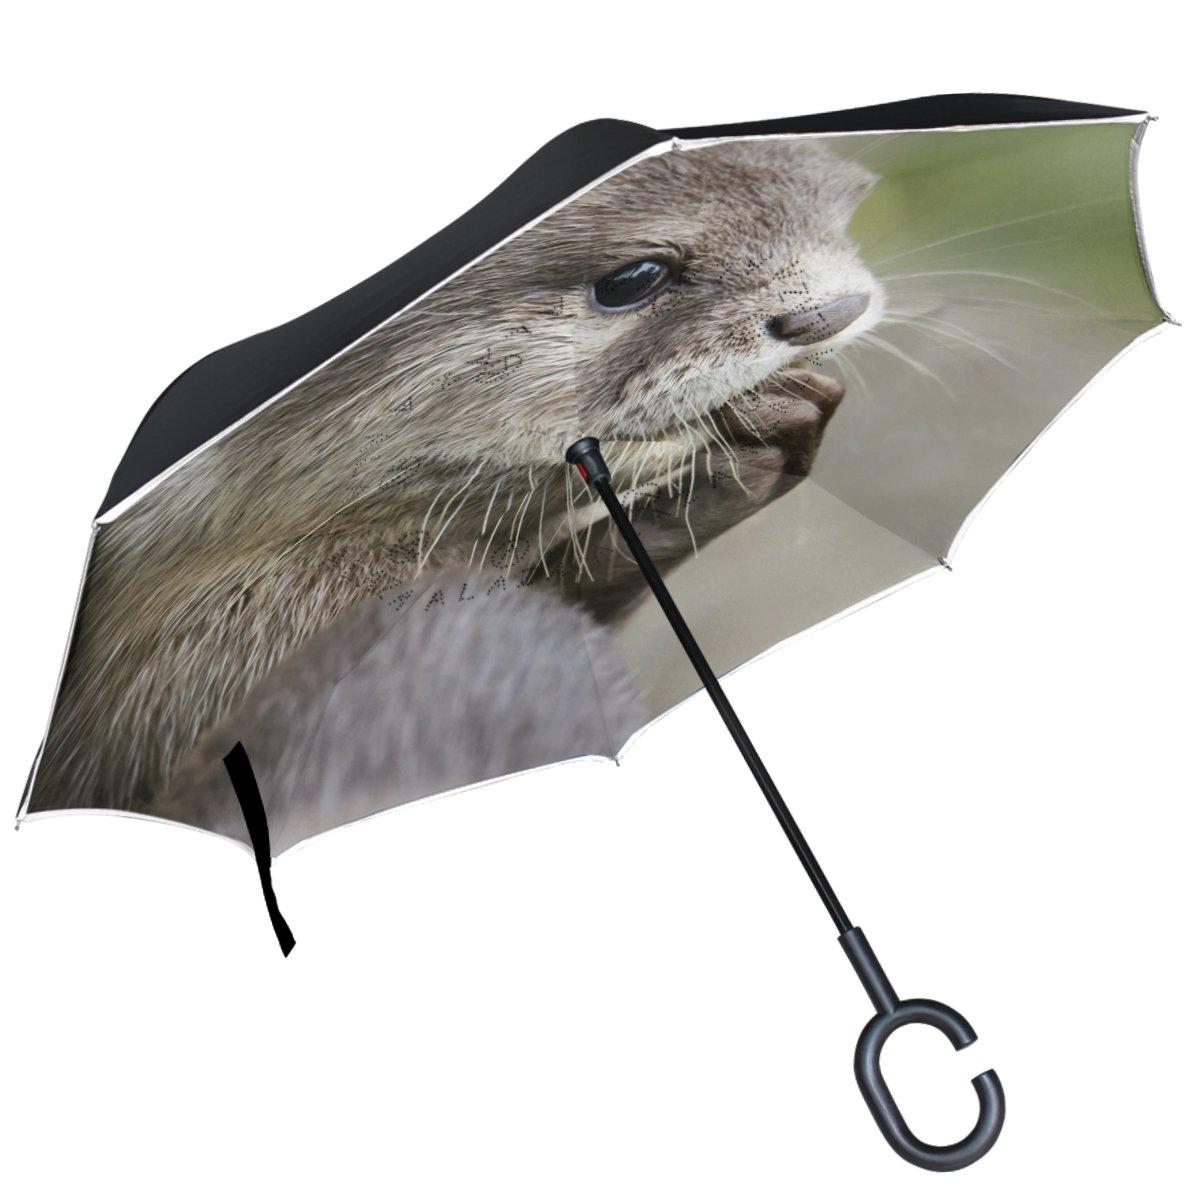 Custom Aurora Borealis Compact Travel Windproof Rainproof Foldable Umbrella